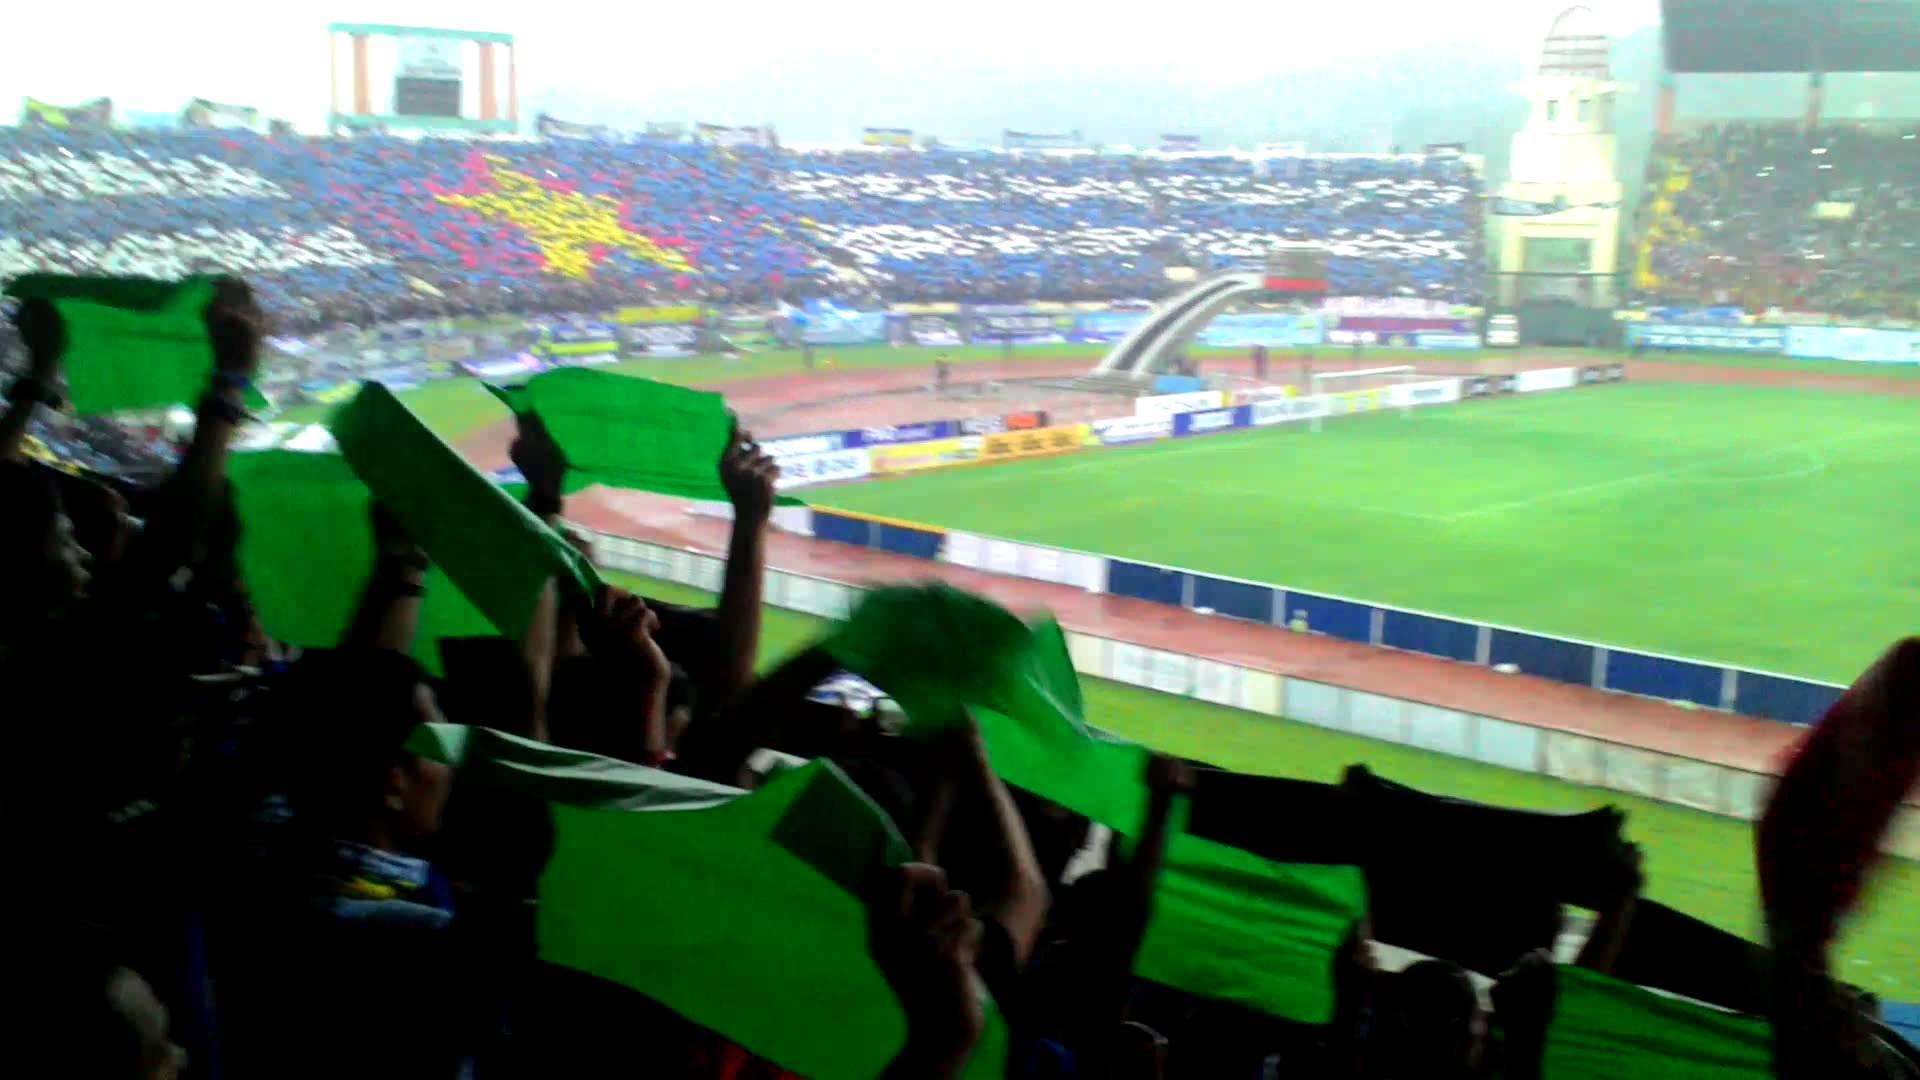 Suasana Stadion Jalak Harupat Koreografi Bbtoh Youtube Kab Bandung